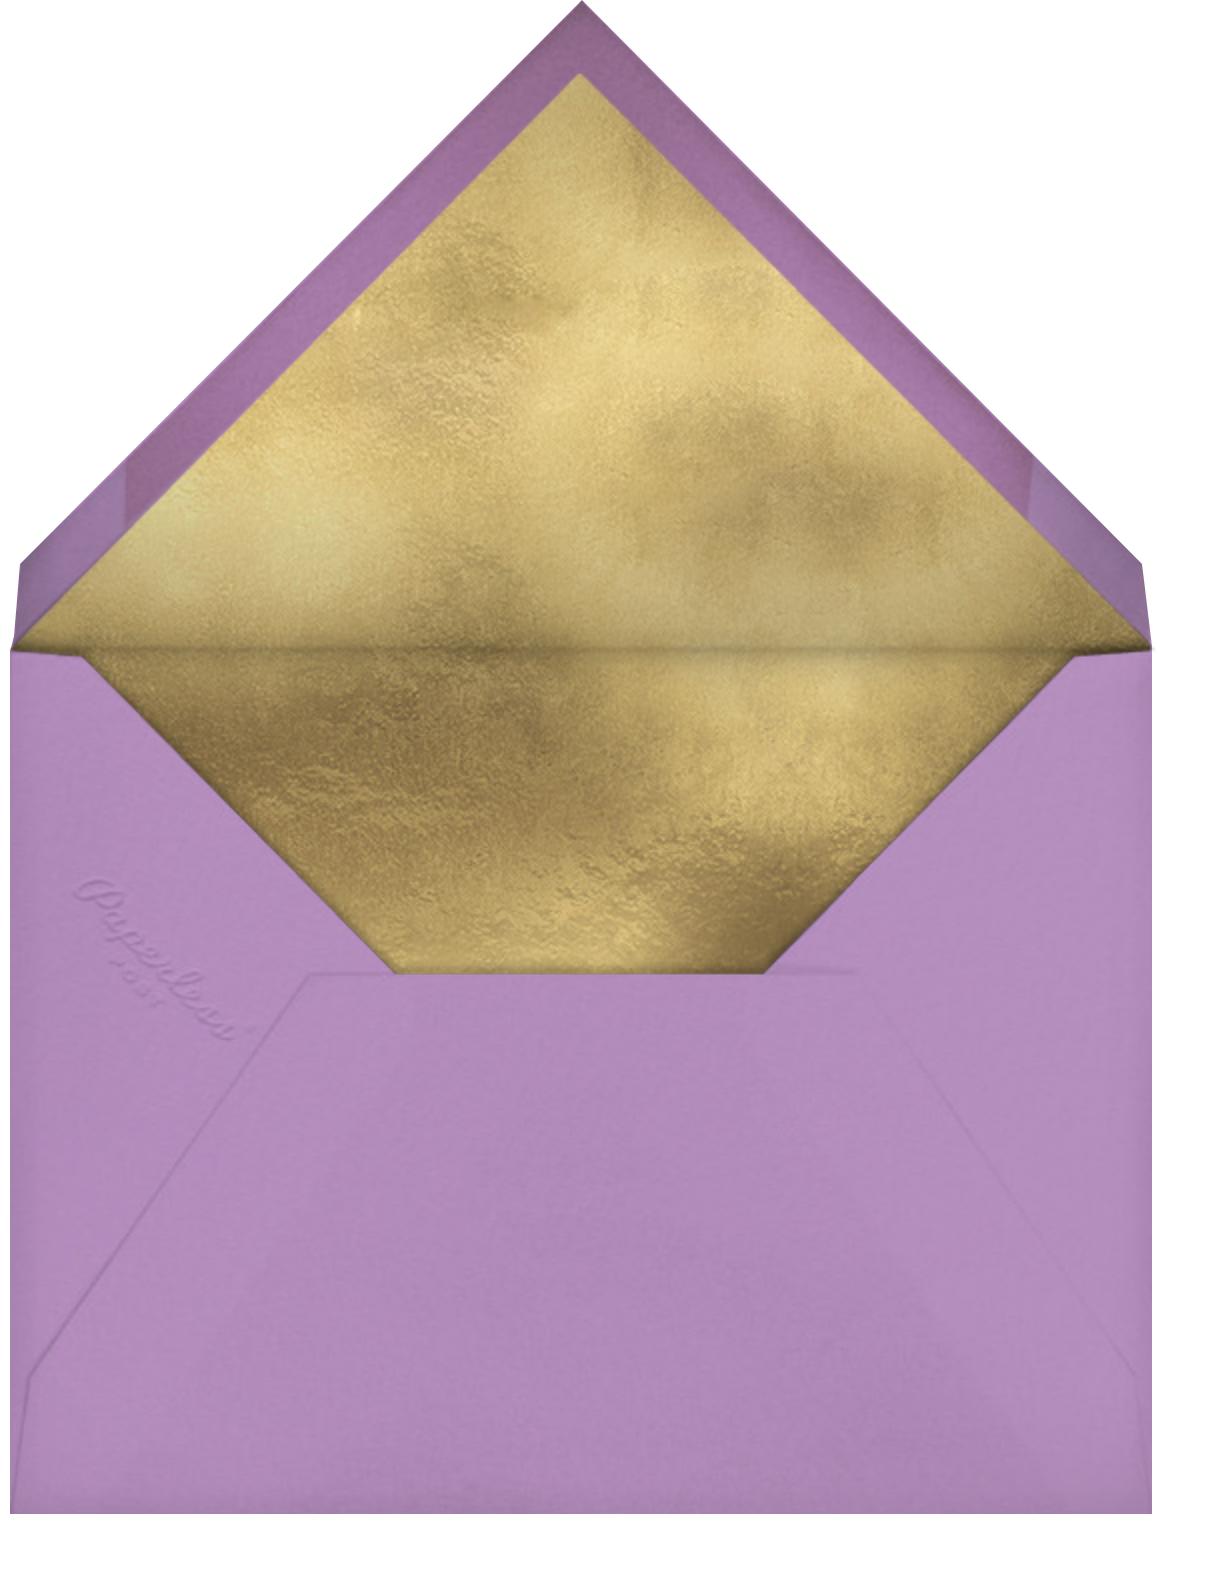 Peacocking - Lilac - Jonathan Adler - Envelope